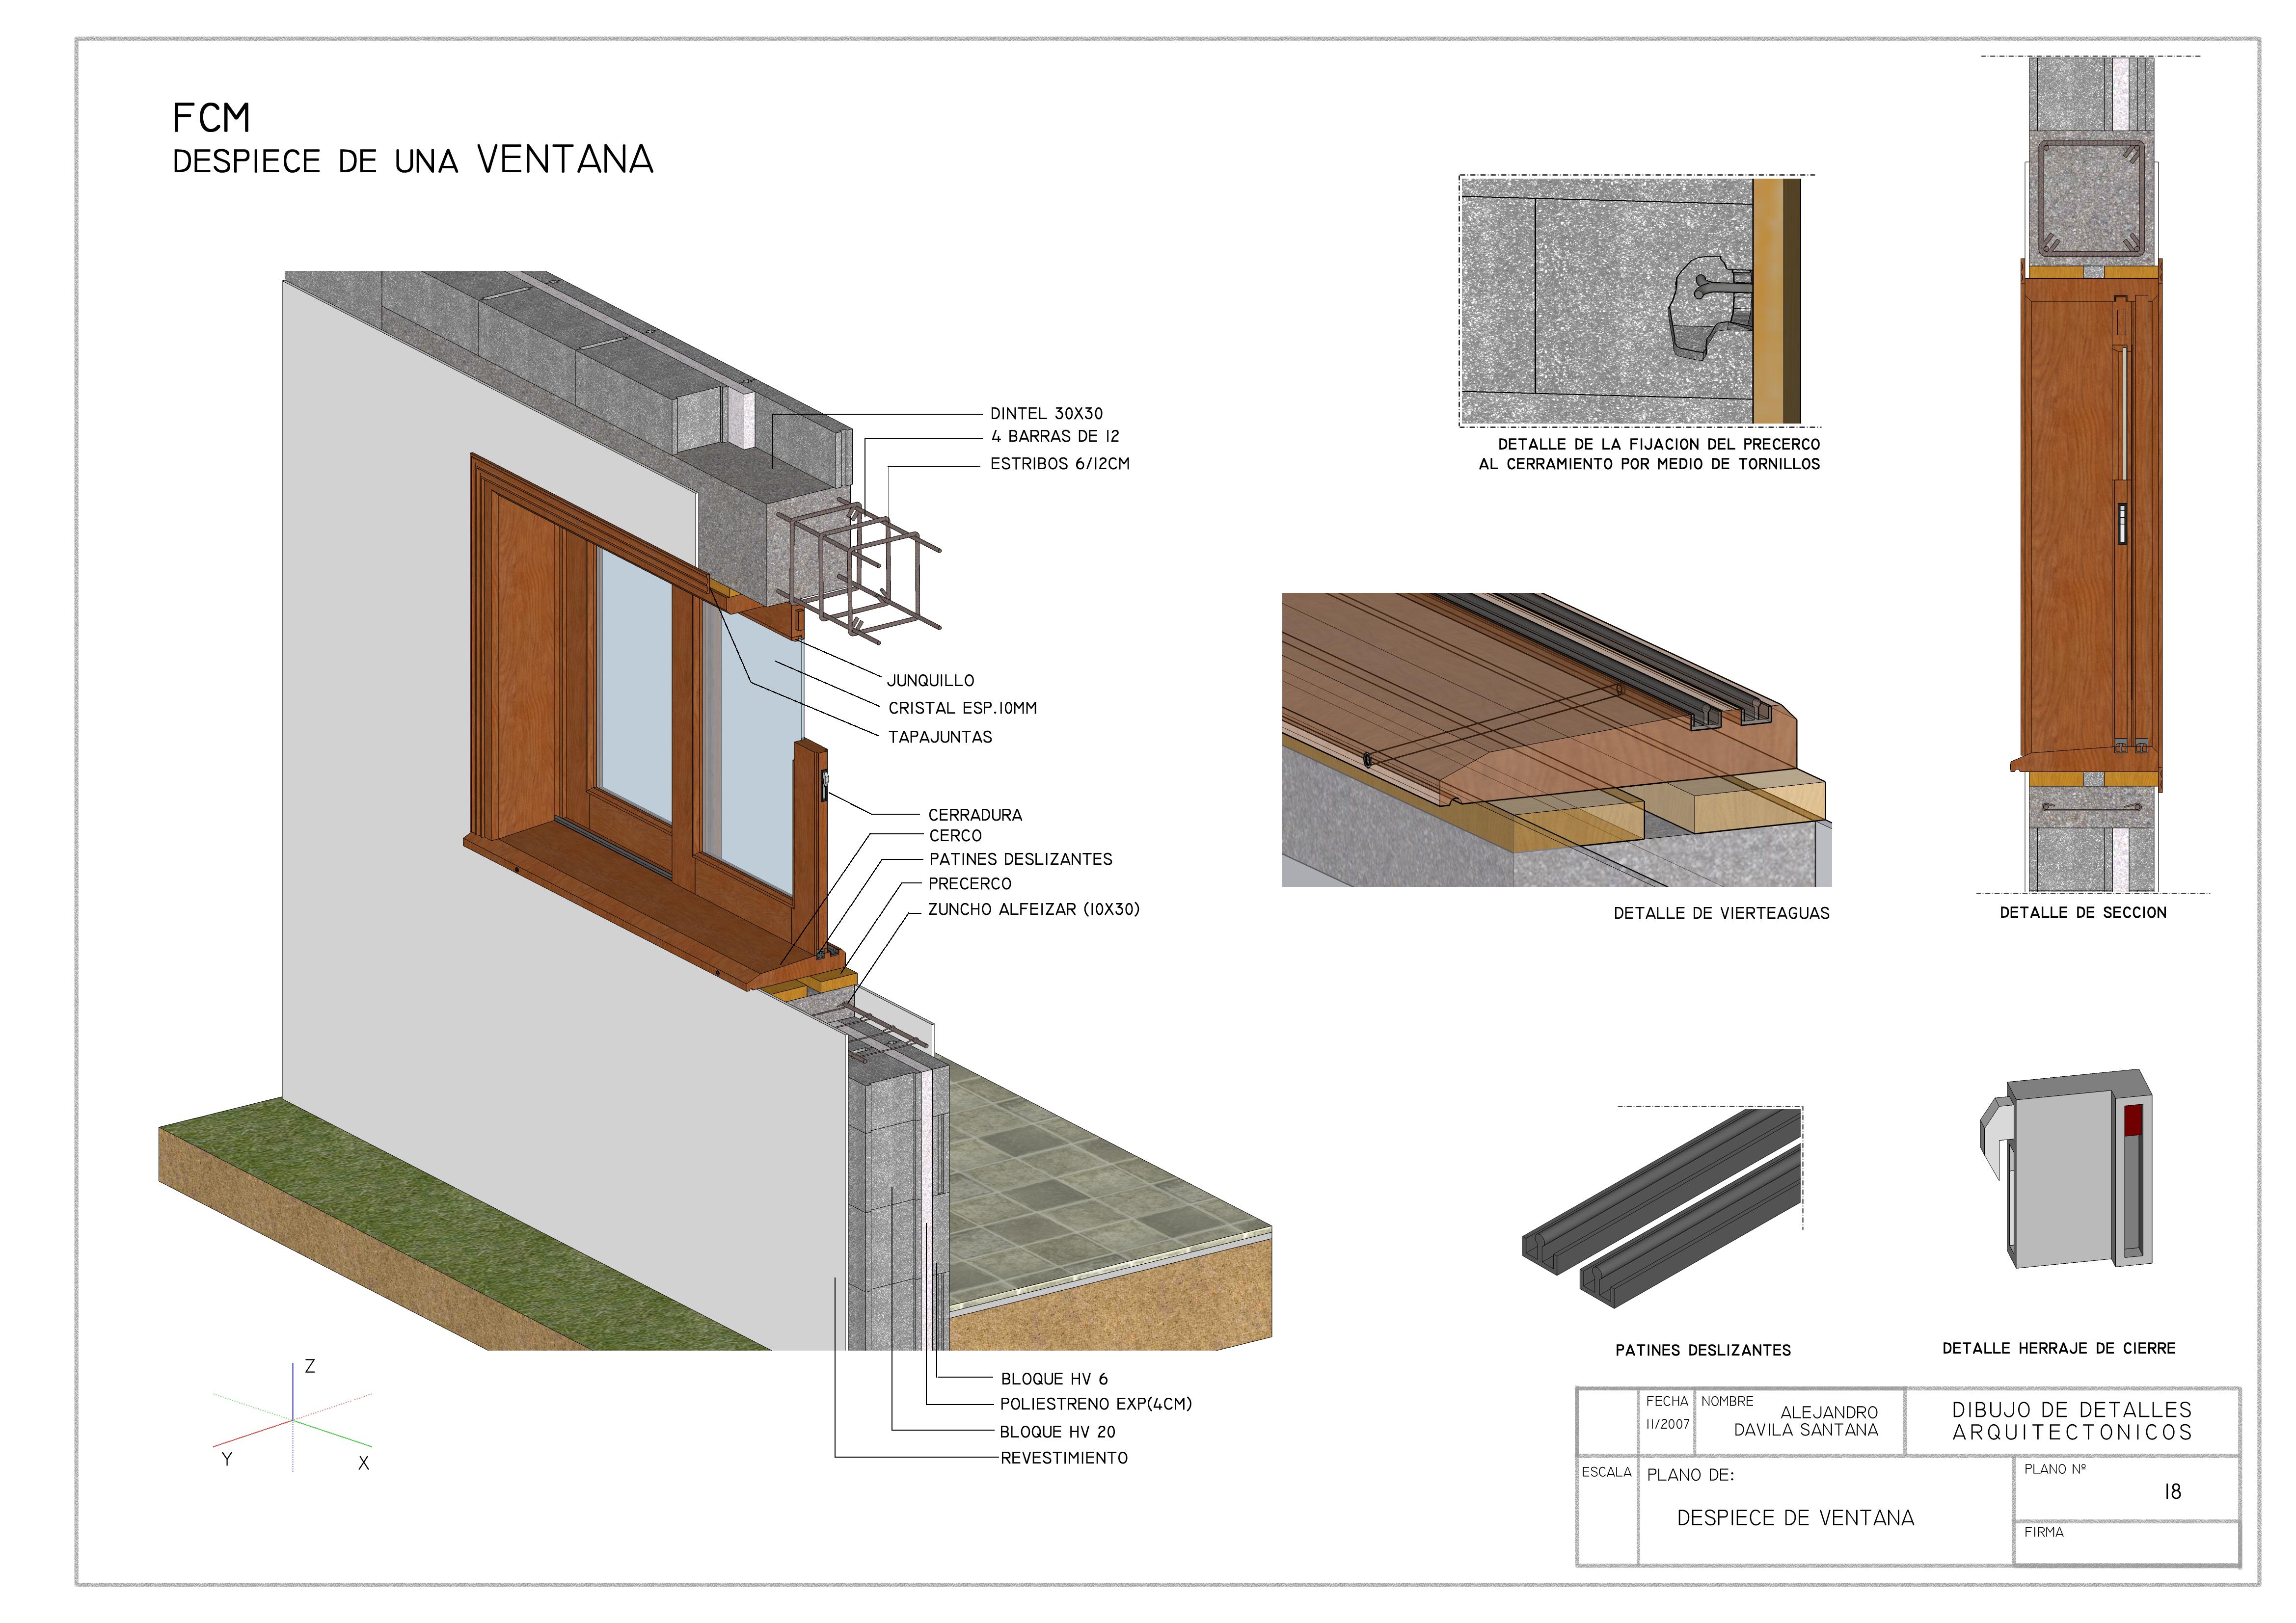 Detalles constructivos iii alejandro d vila santana - Detalle carpinteria aluminio ...